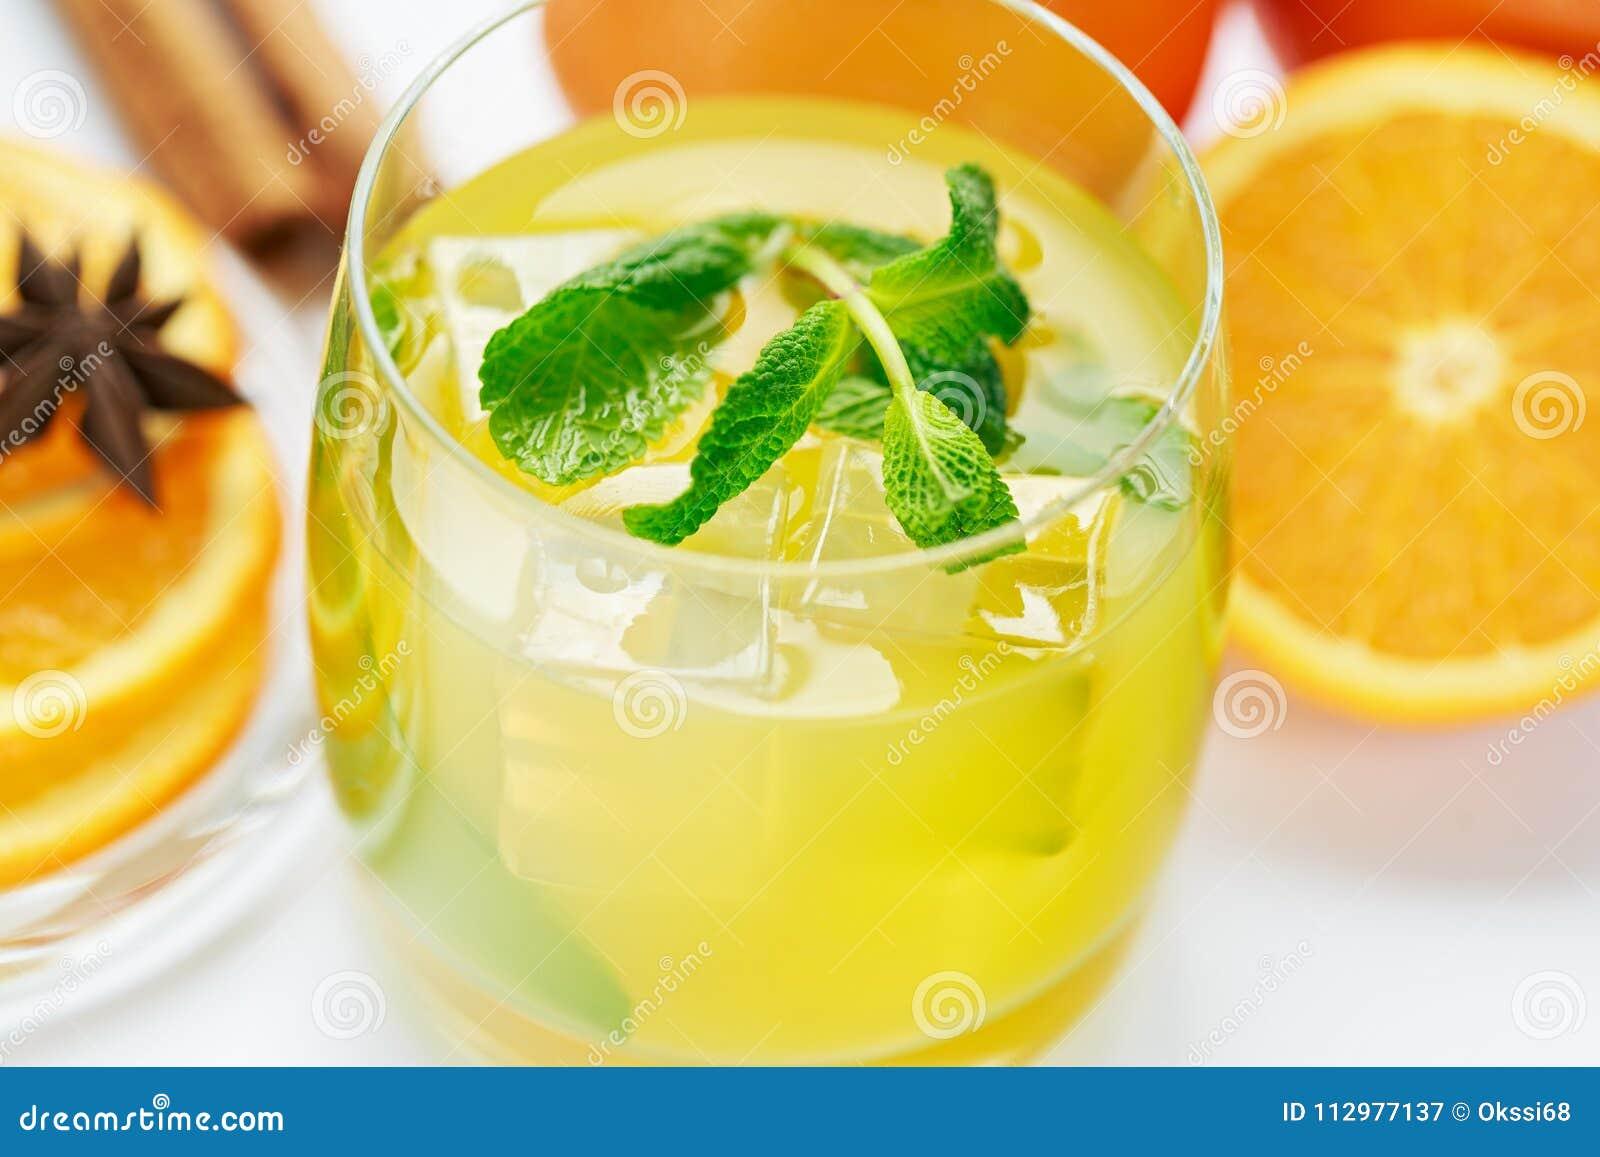 Juice from fresh oranges